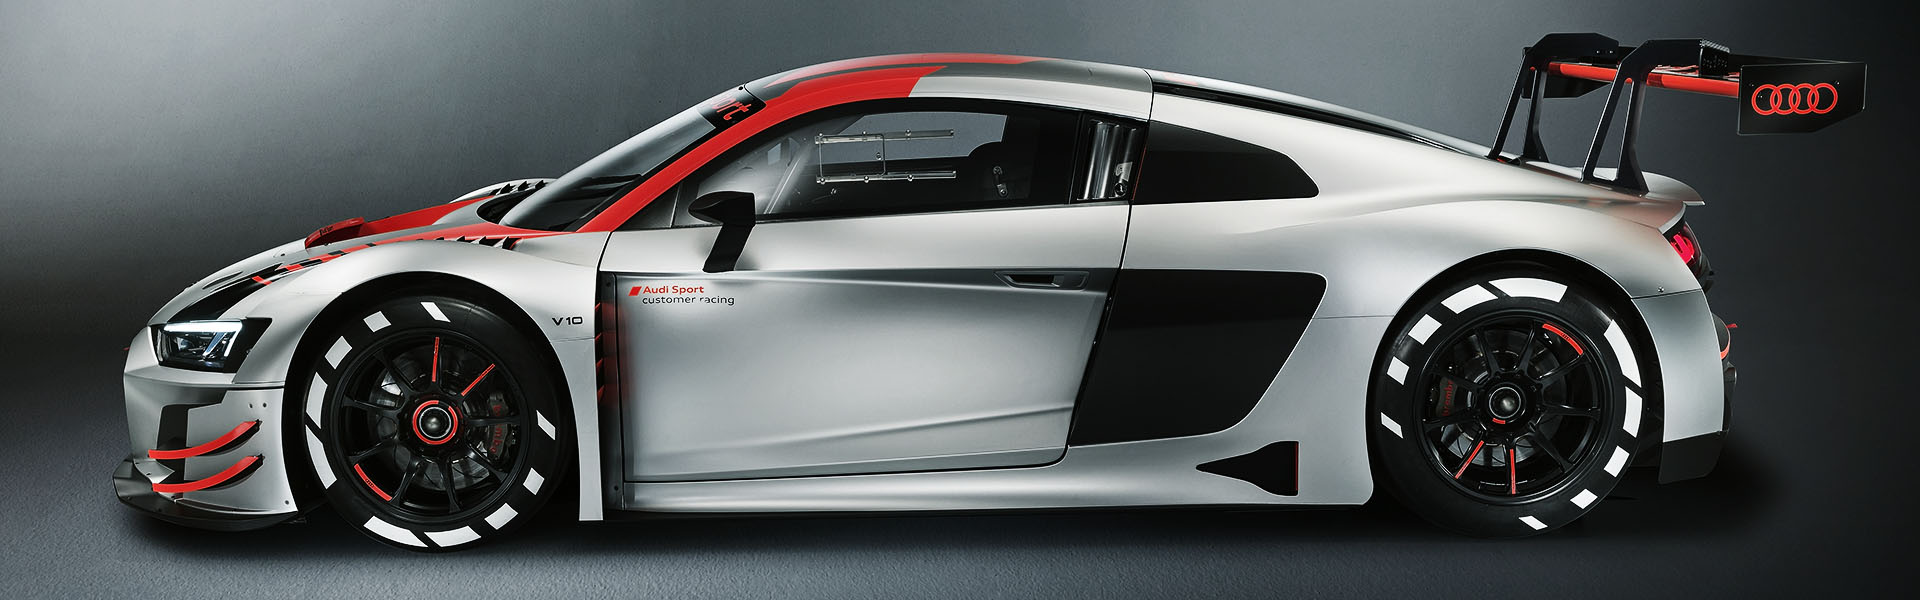 R8 Lms Gt3 Audi Com